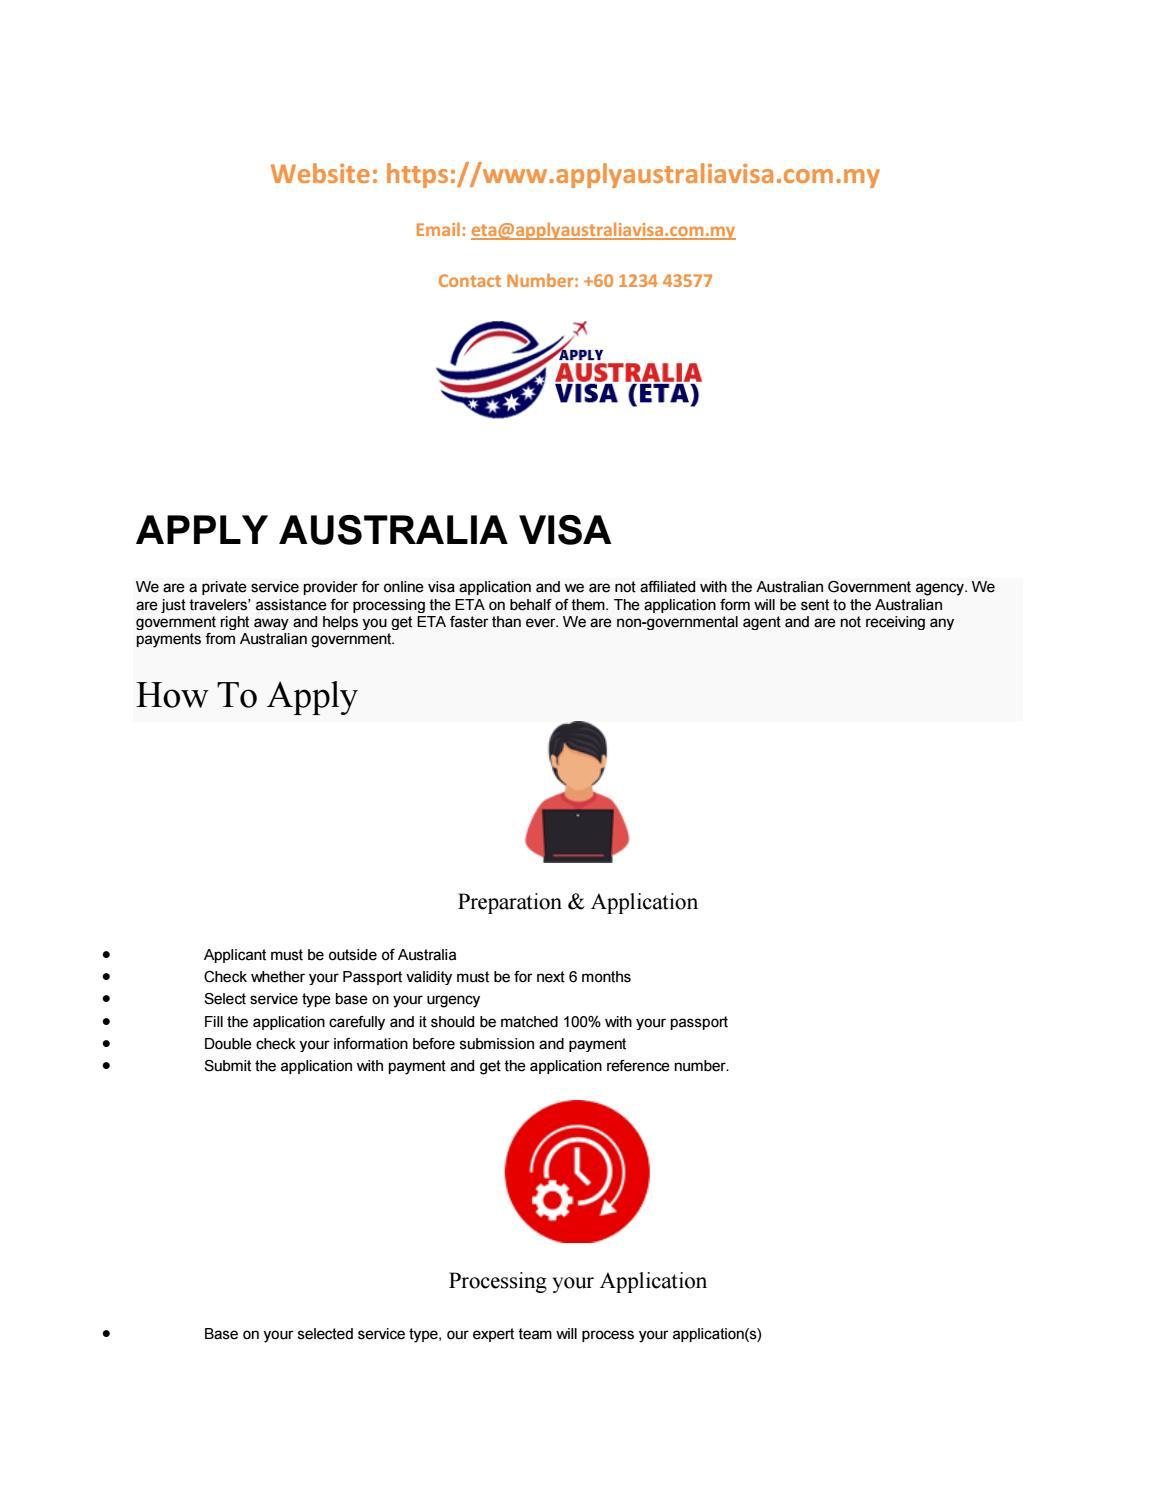 Australia visa apply Malaysia | Australia visa eta Malaysia